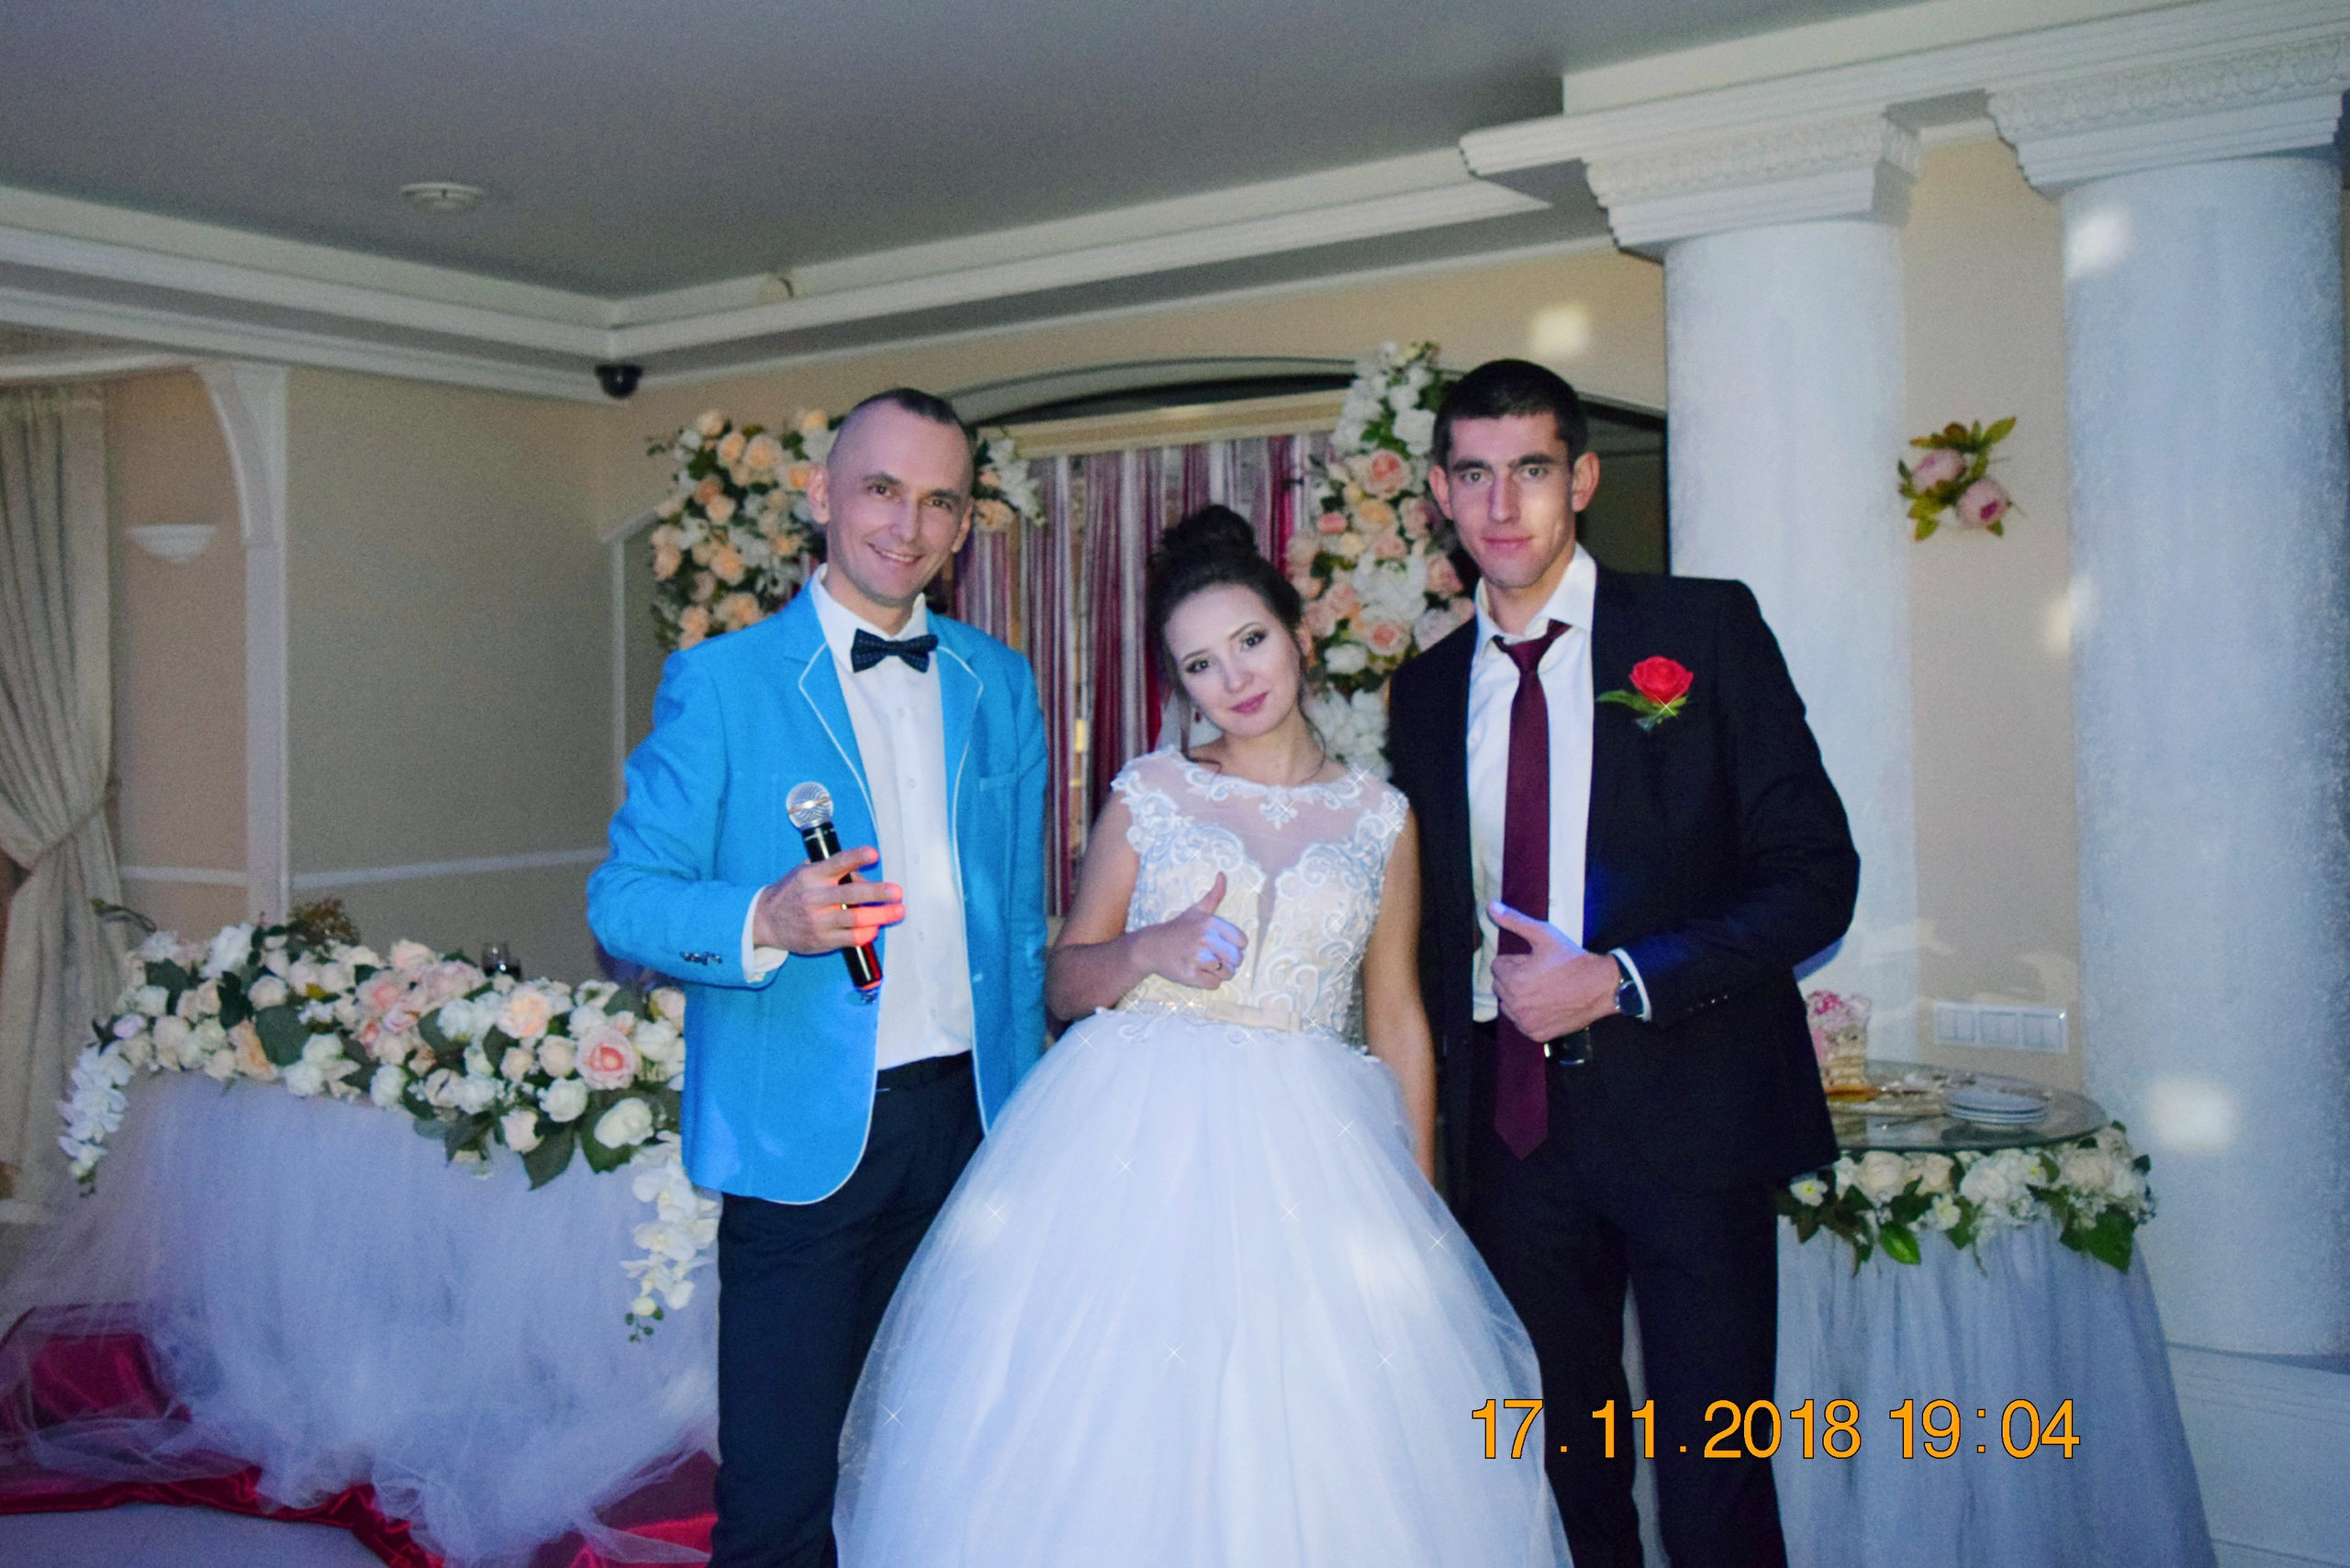 njKWAPWChnQ - Свадьба Тимура и Кристины